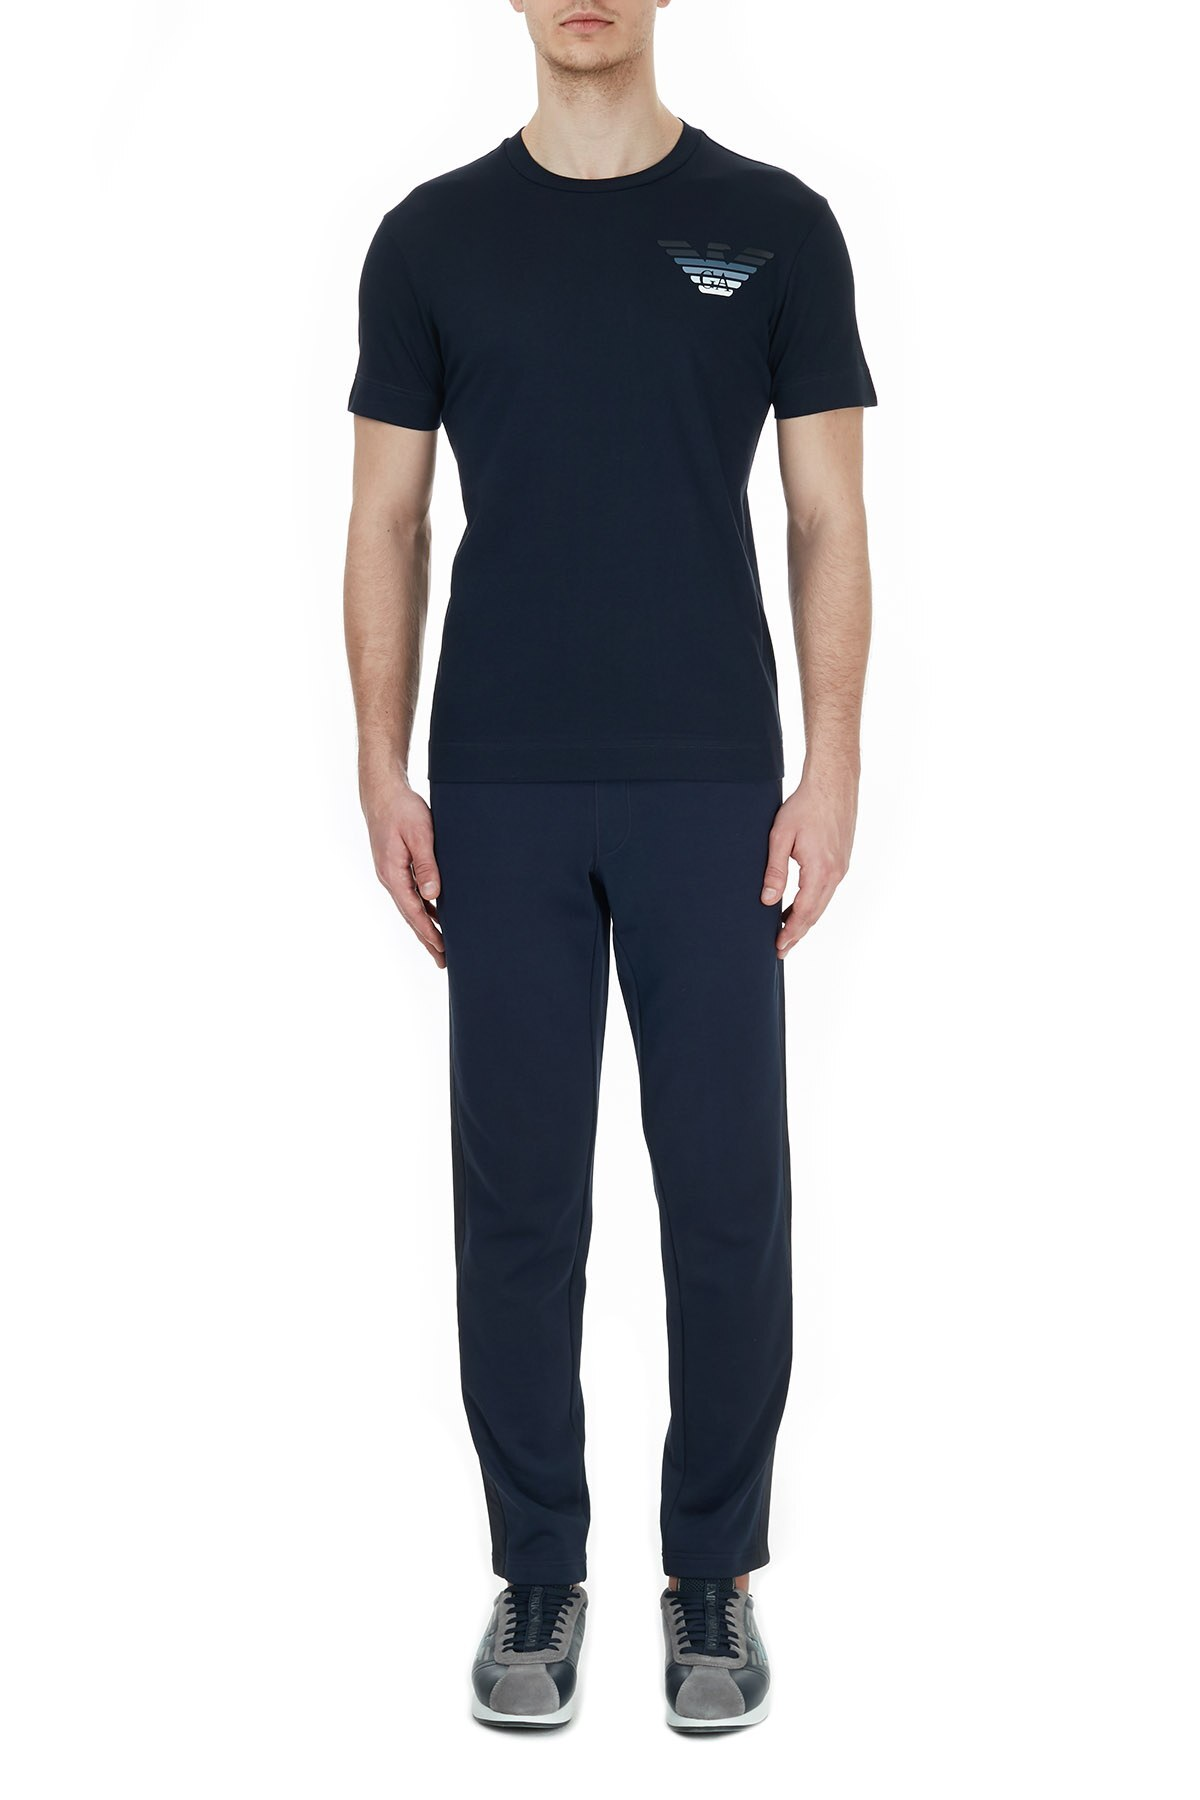 Emporio Armani Erkek T Shirt 6H1T6G 1JSHZ 0929 LACİVERT